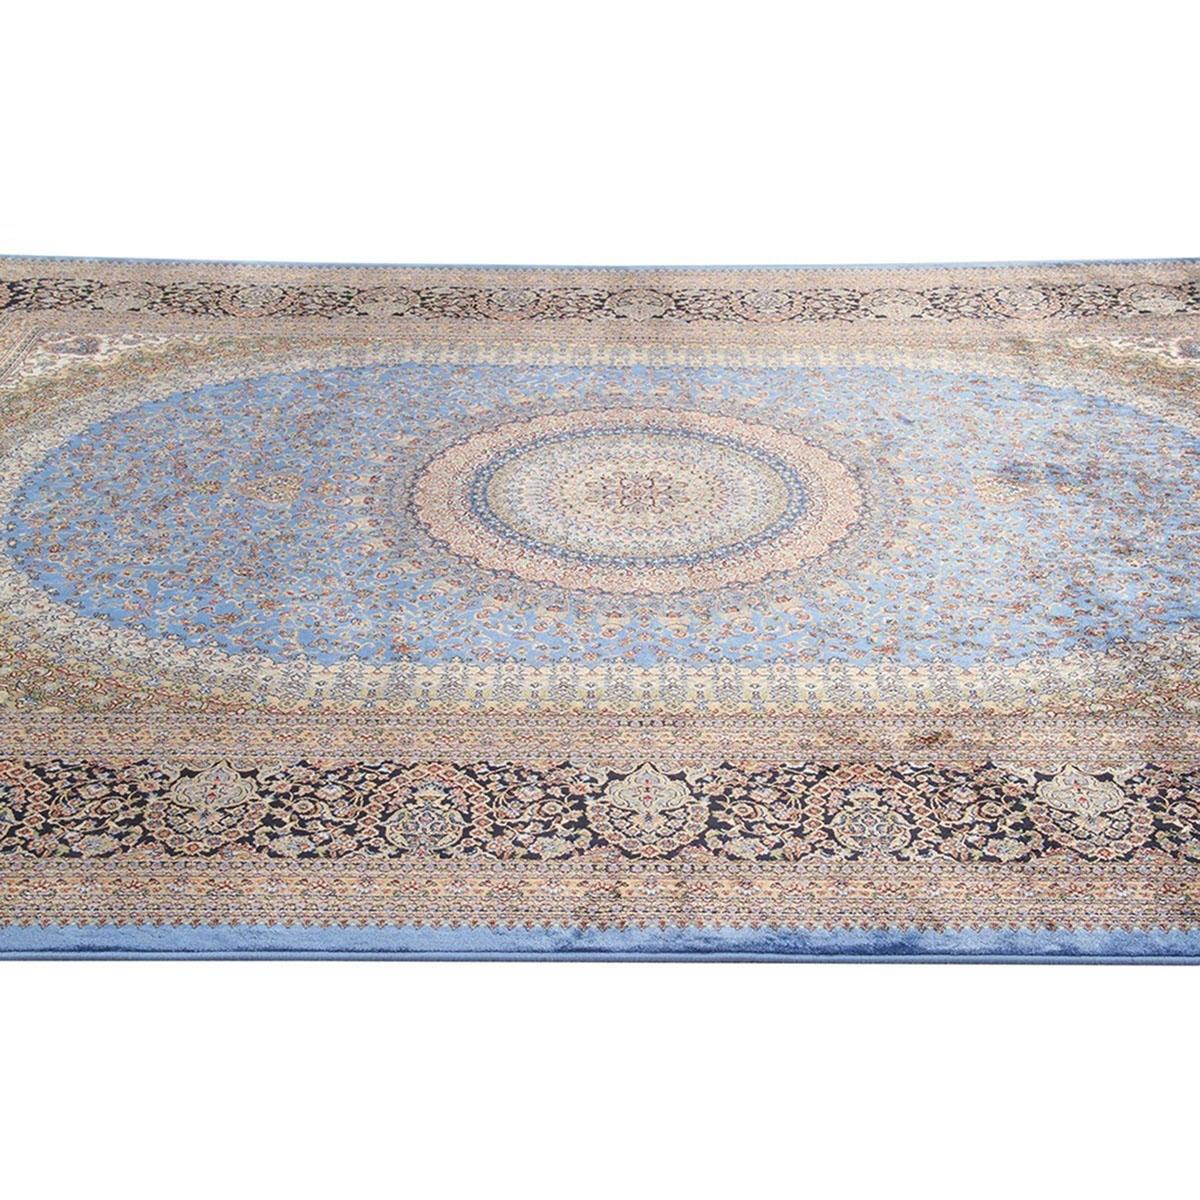 Tappeto Qoum Shah 5 in cotone, blu, 200x290 - 5